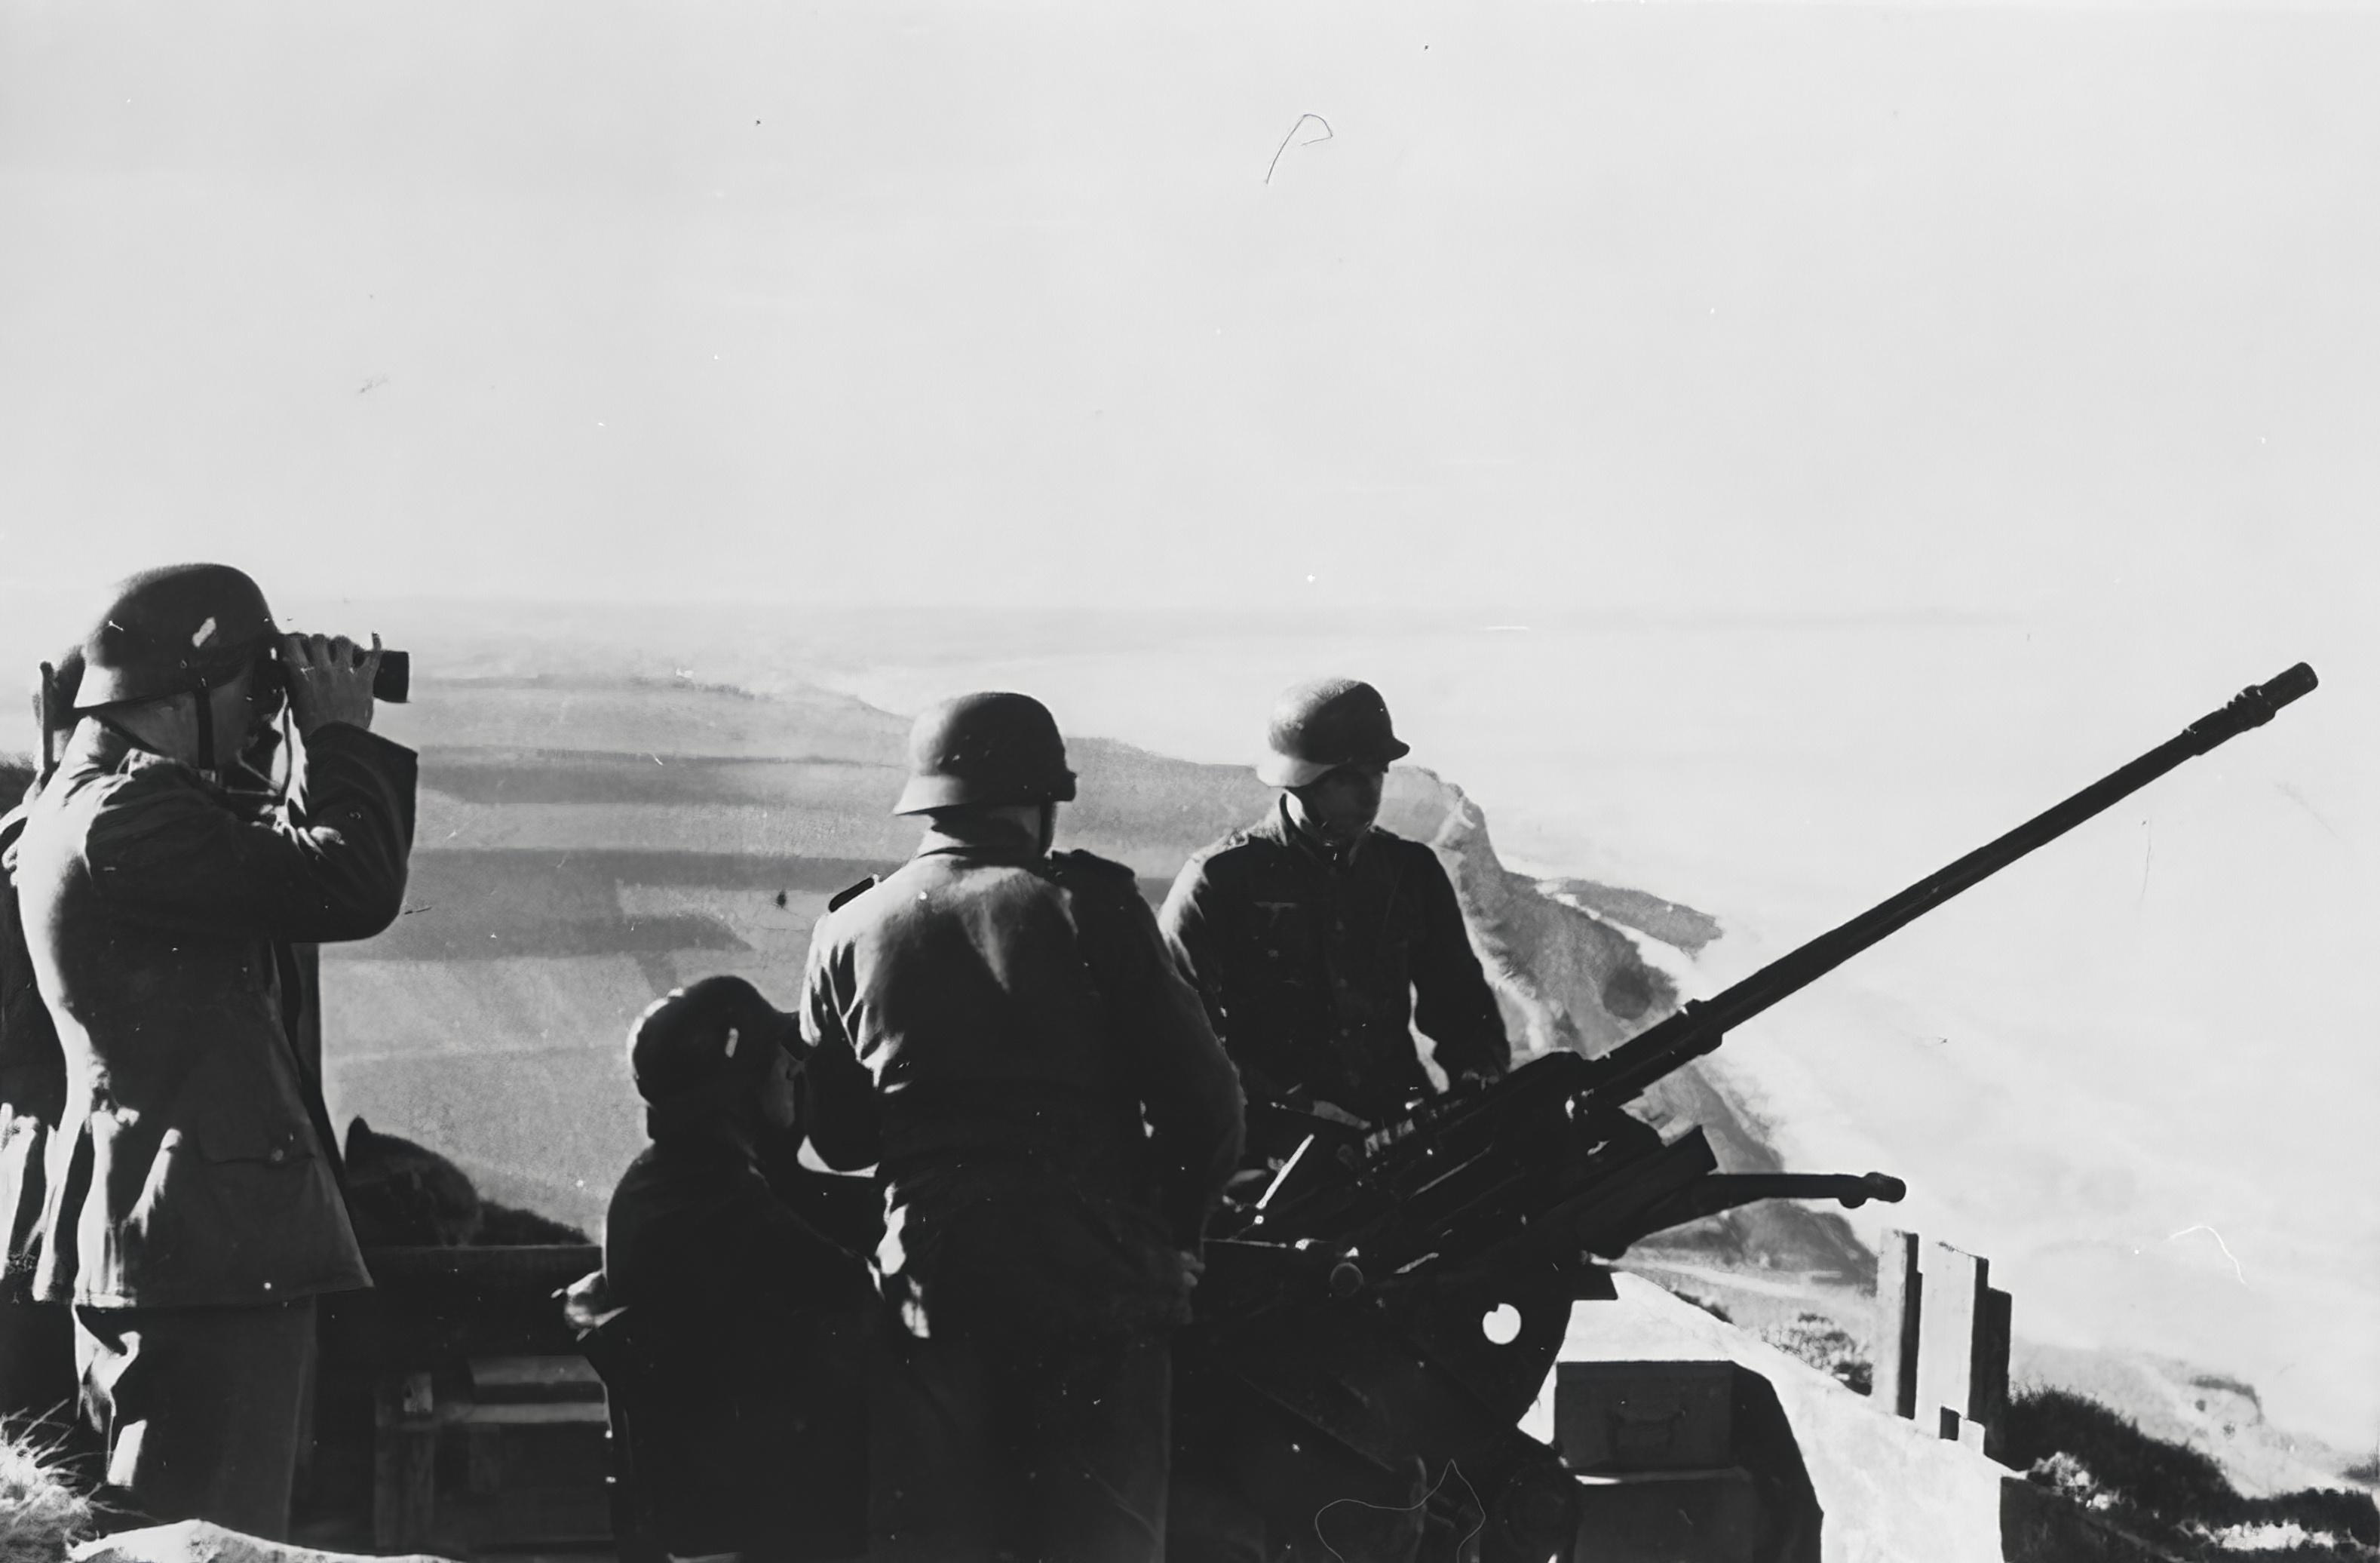 German coastal flak battery established in France after the fall 3rd Dec 1940 NIOD